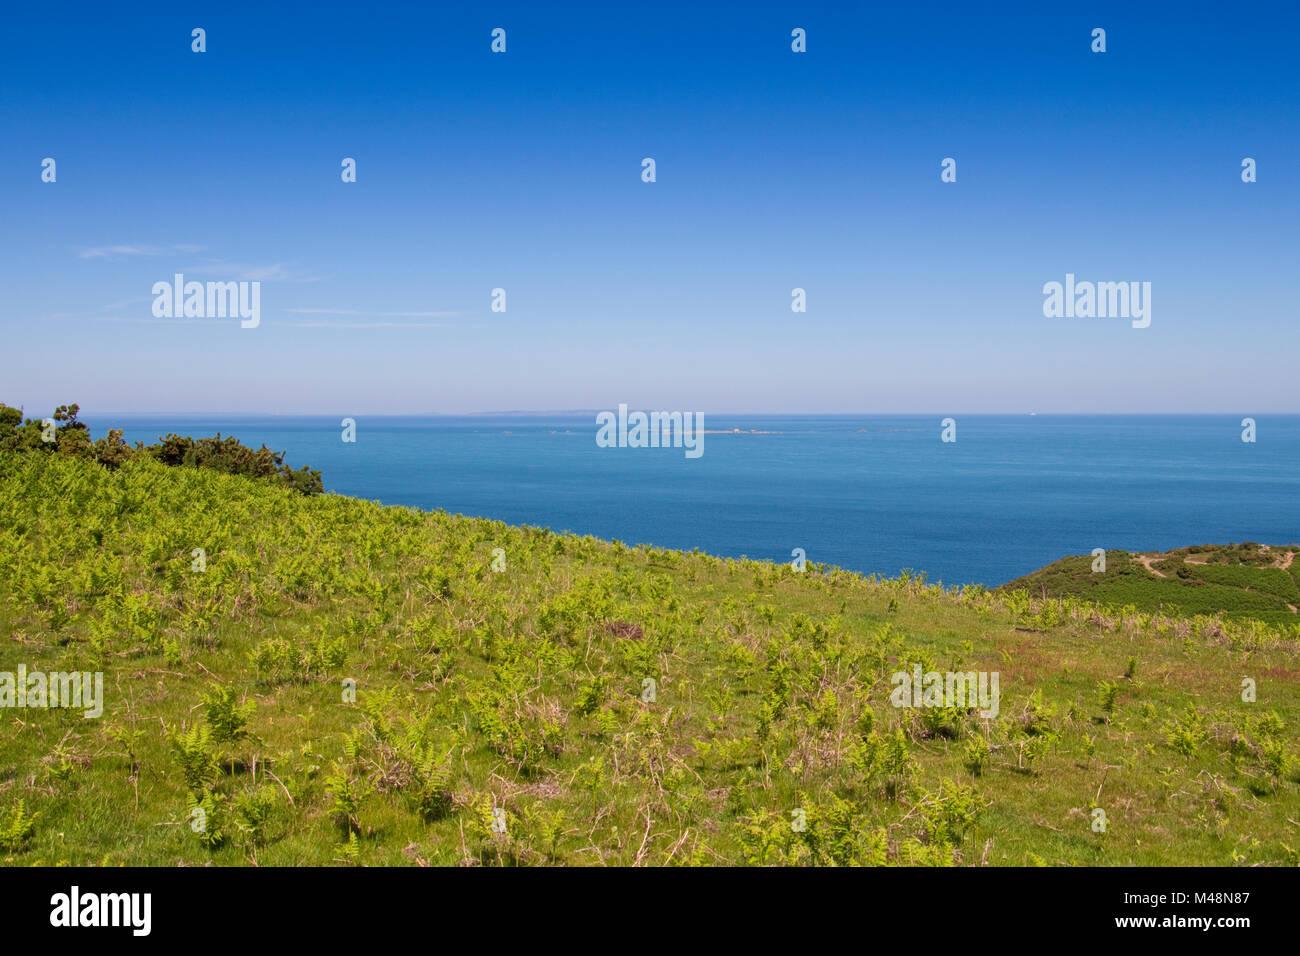 Jersey uk beaches stock photos jersey uk beaches stock for Garden design jersey channel islands